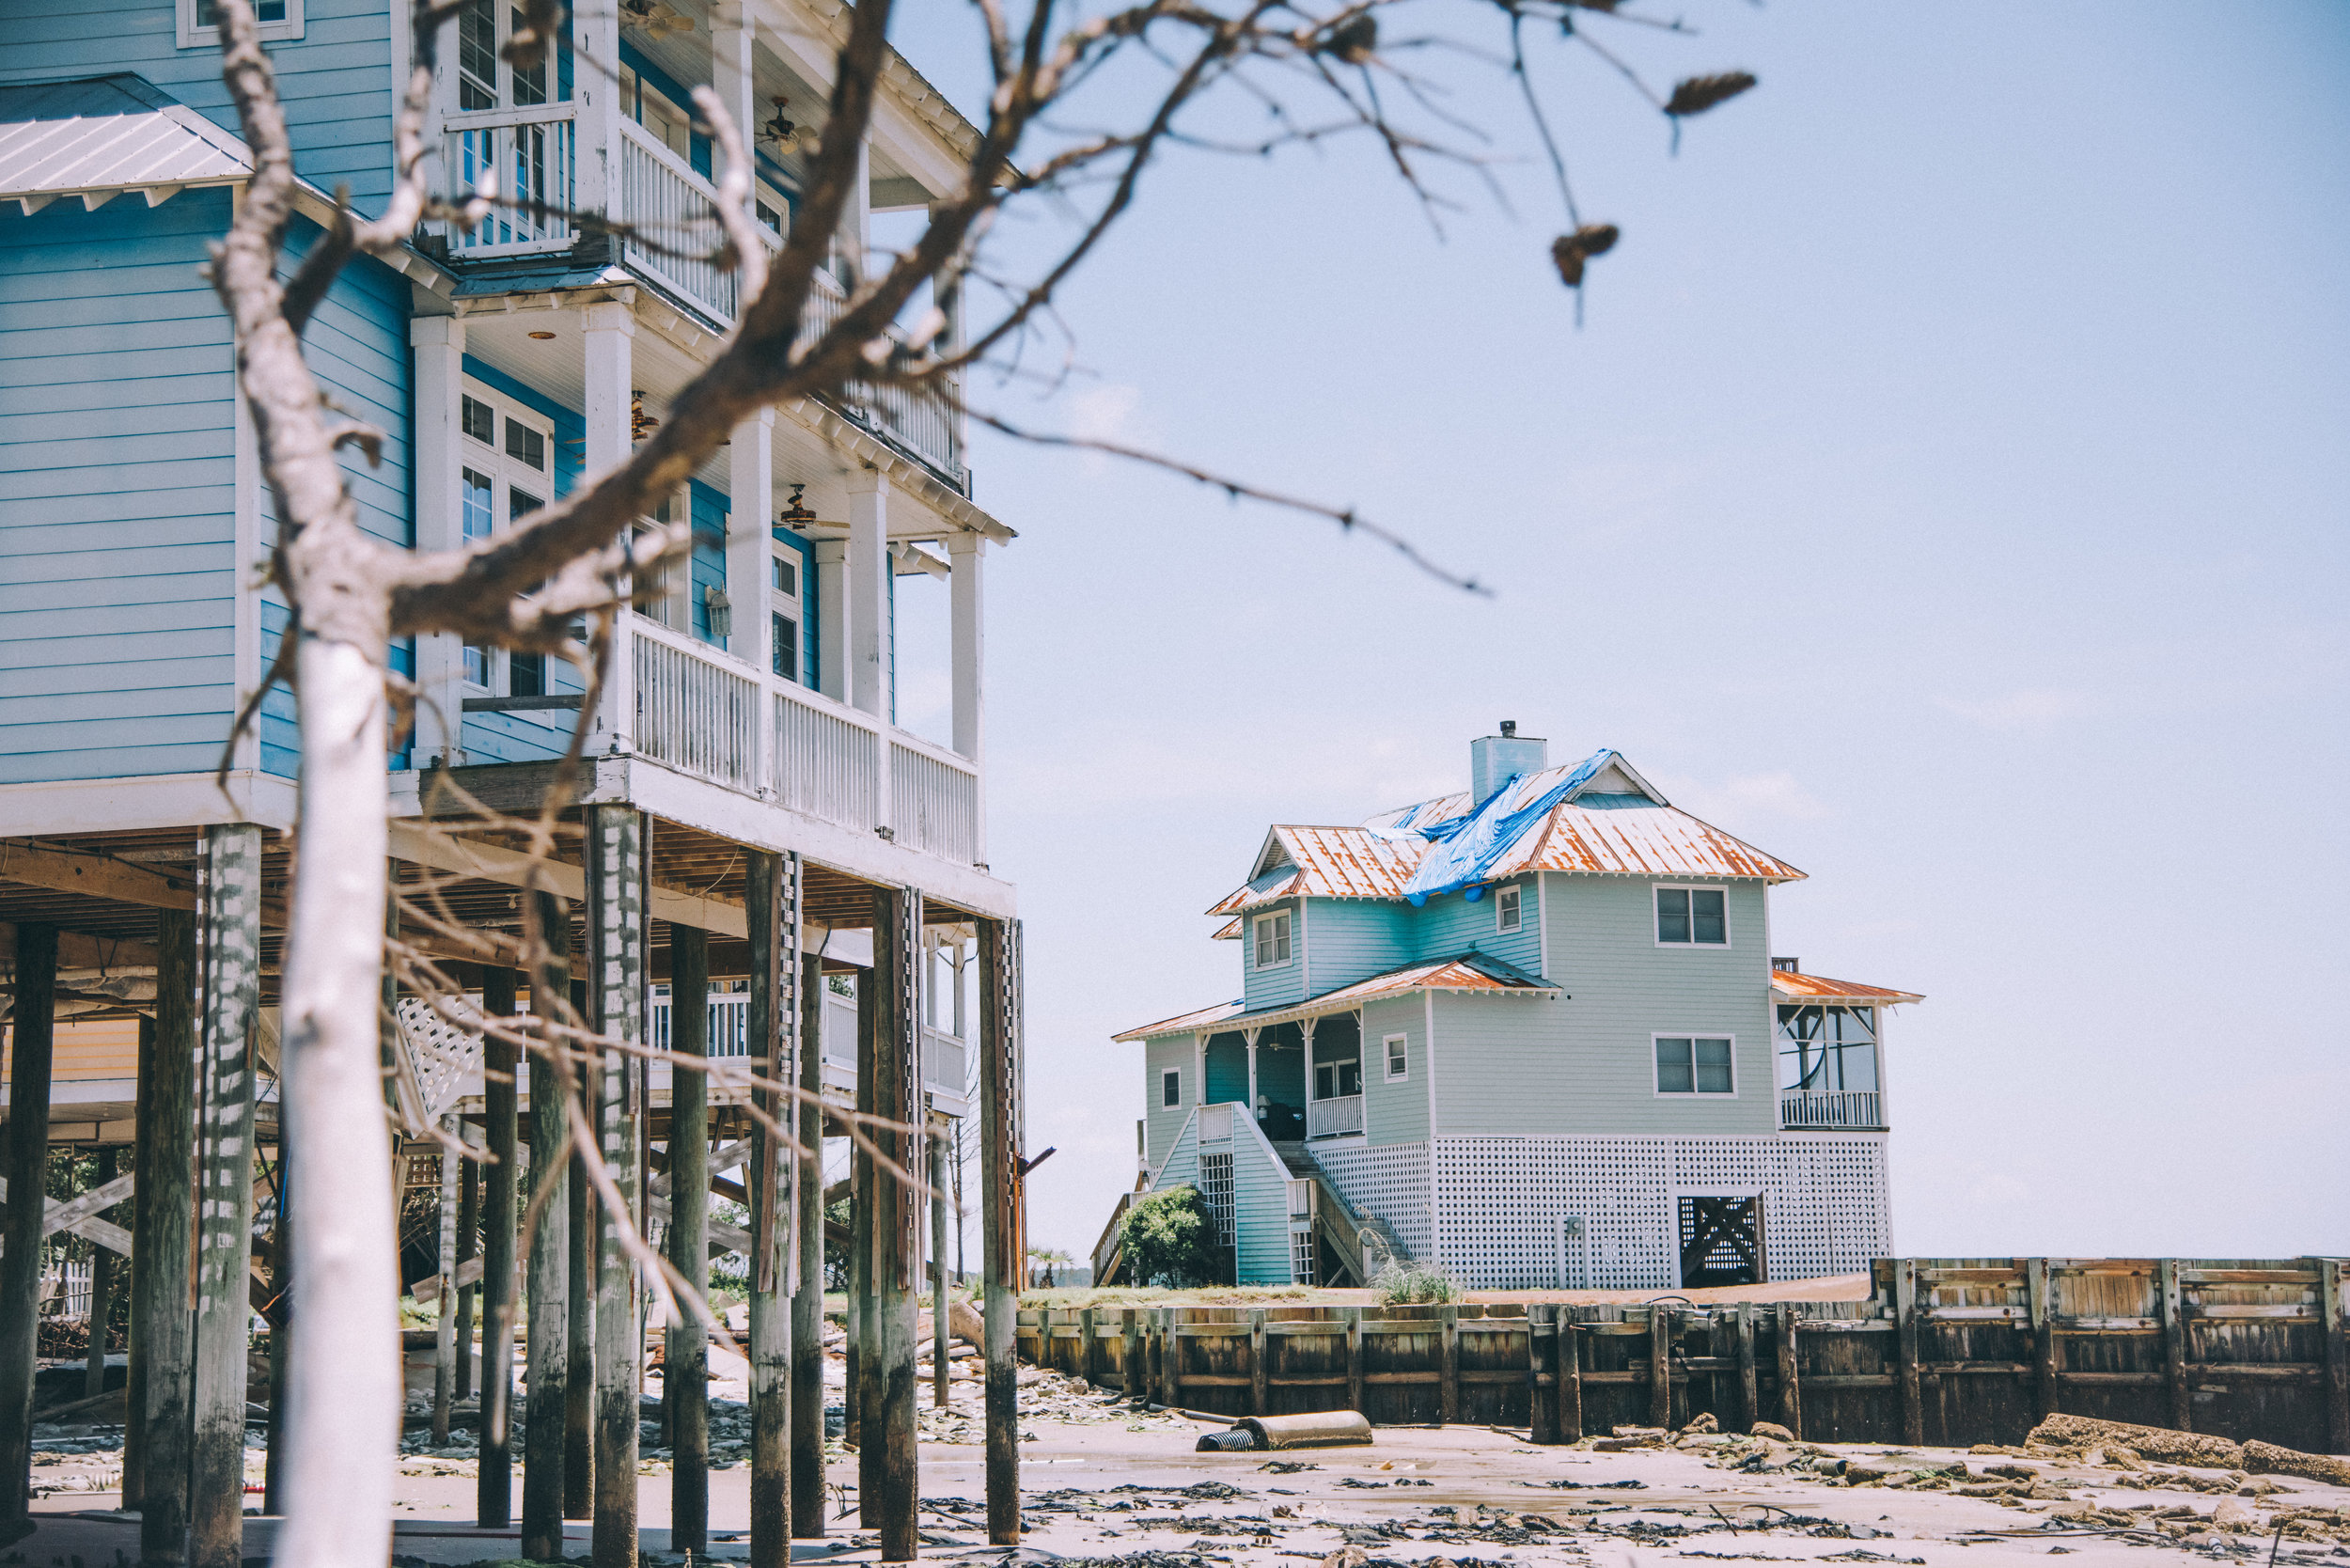 kw-abandoned-beachfront-homes-sc-img7.jpg